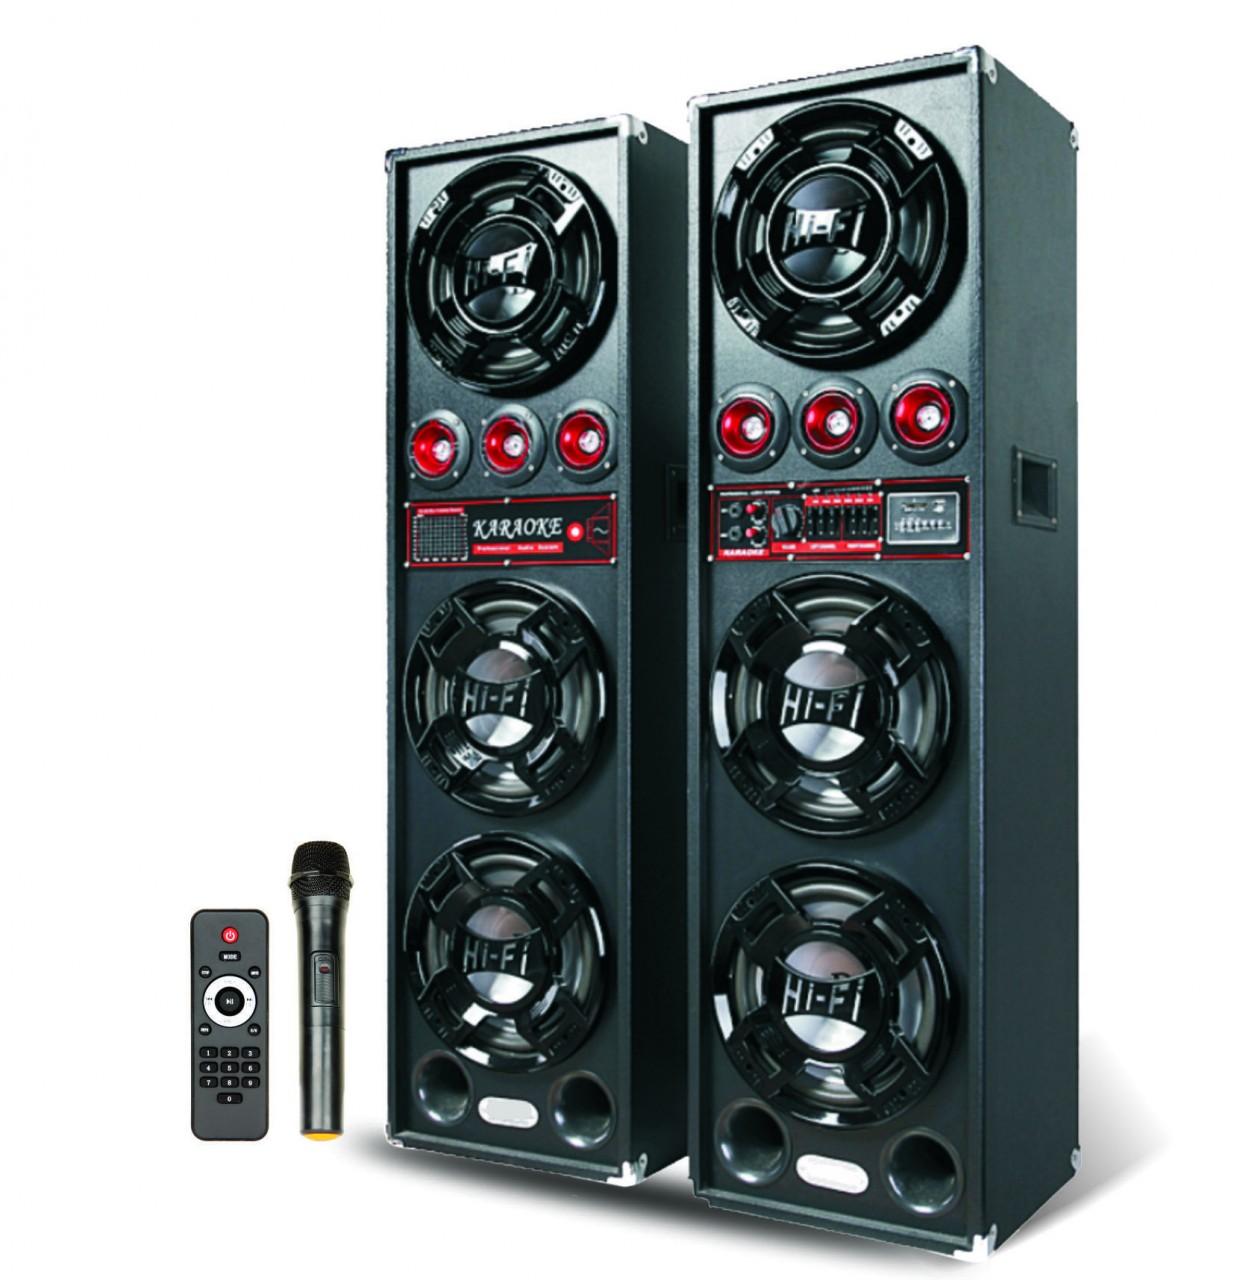 Bt Web Zoom Lunar Speaker Price In Pakistan Home Shopping